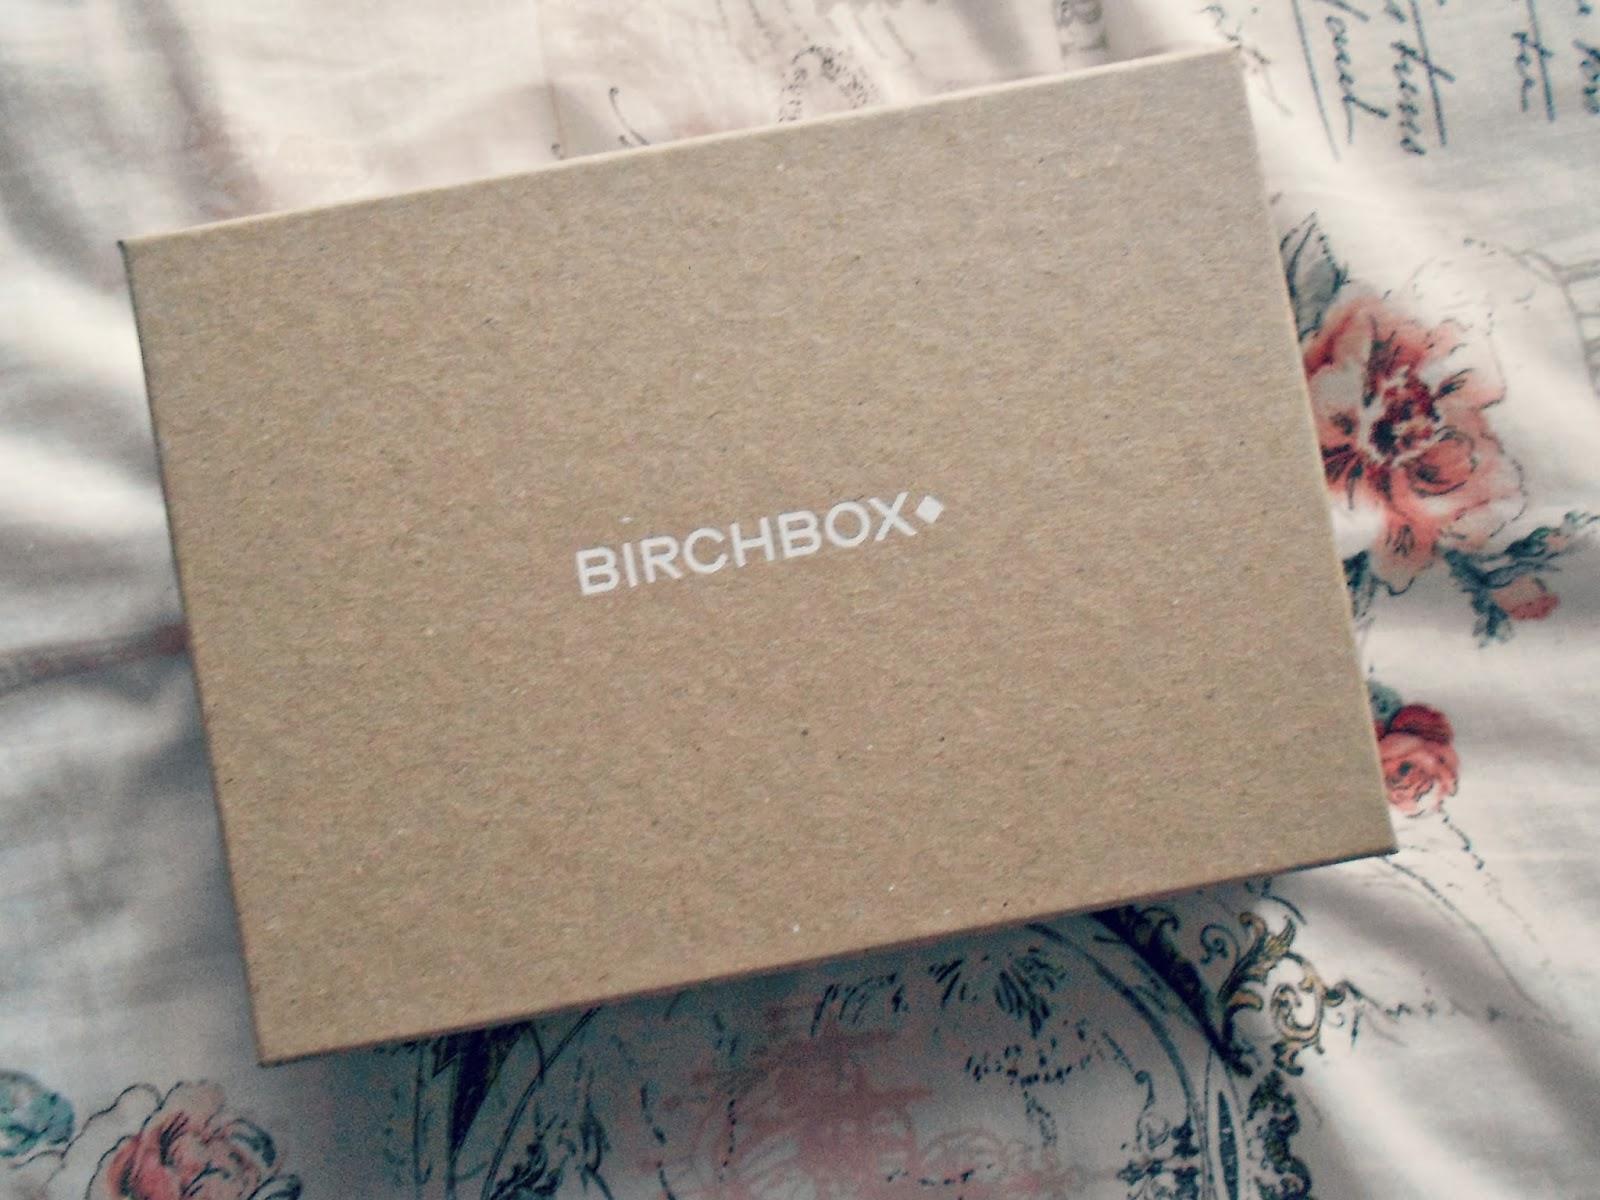 My January Birchbox